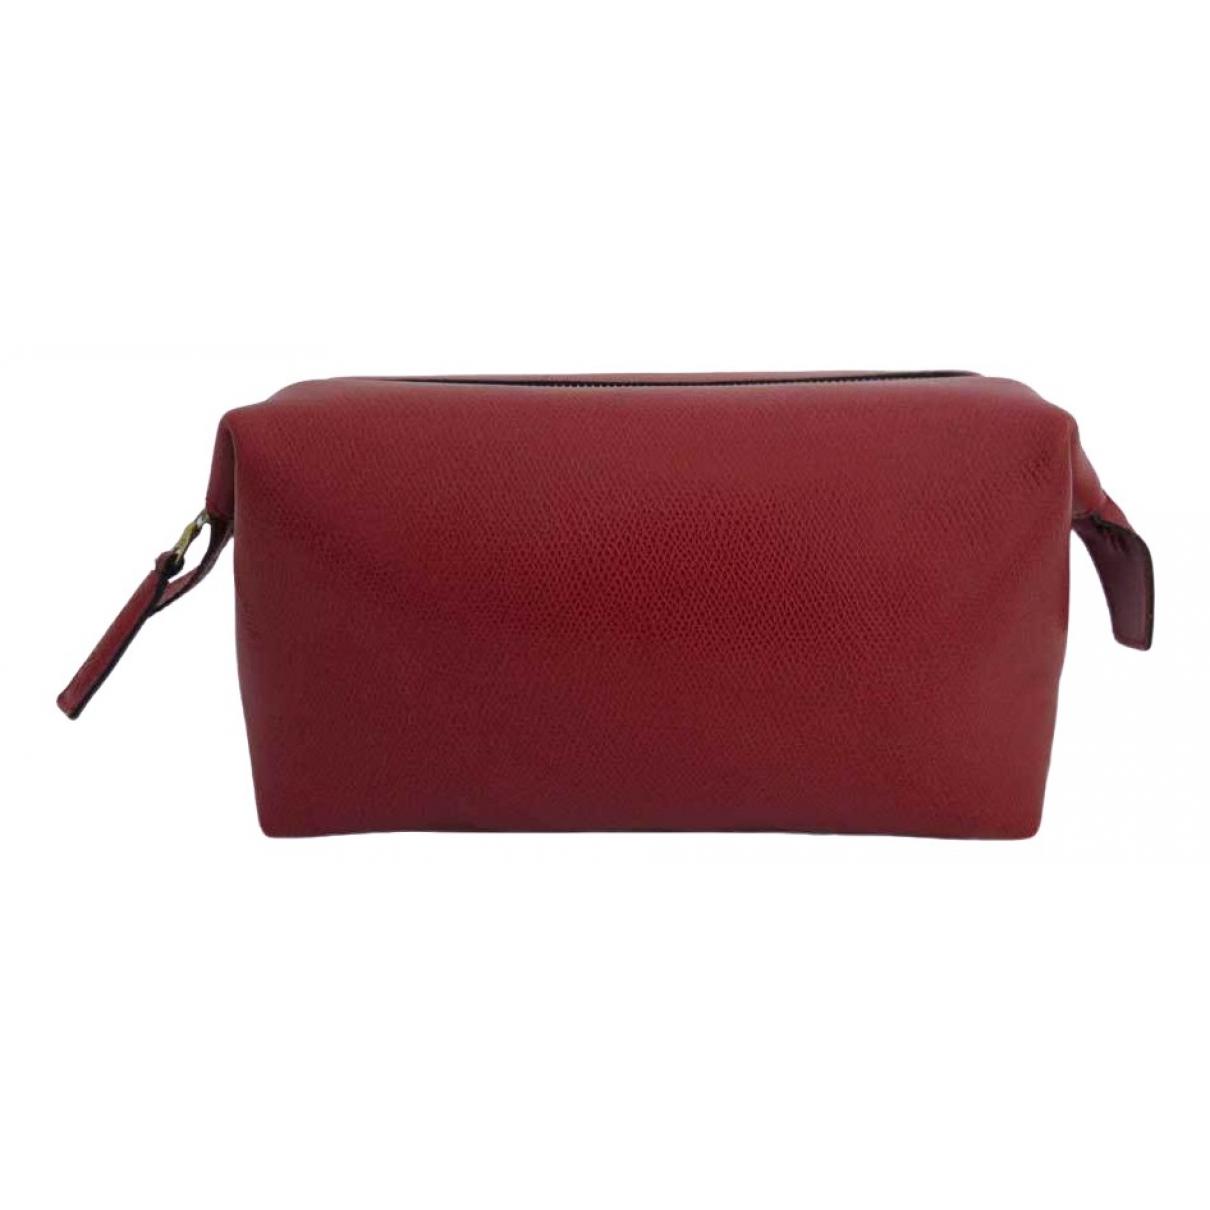 Celine \N Red Leather Travel bag for Women \N